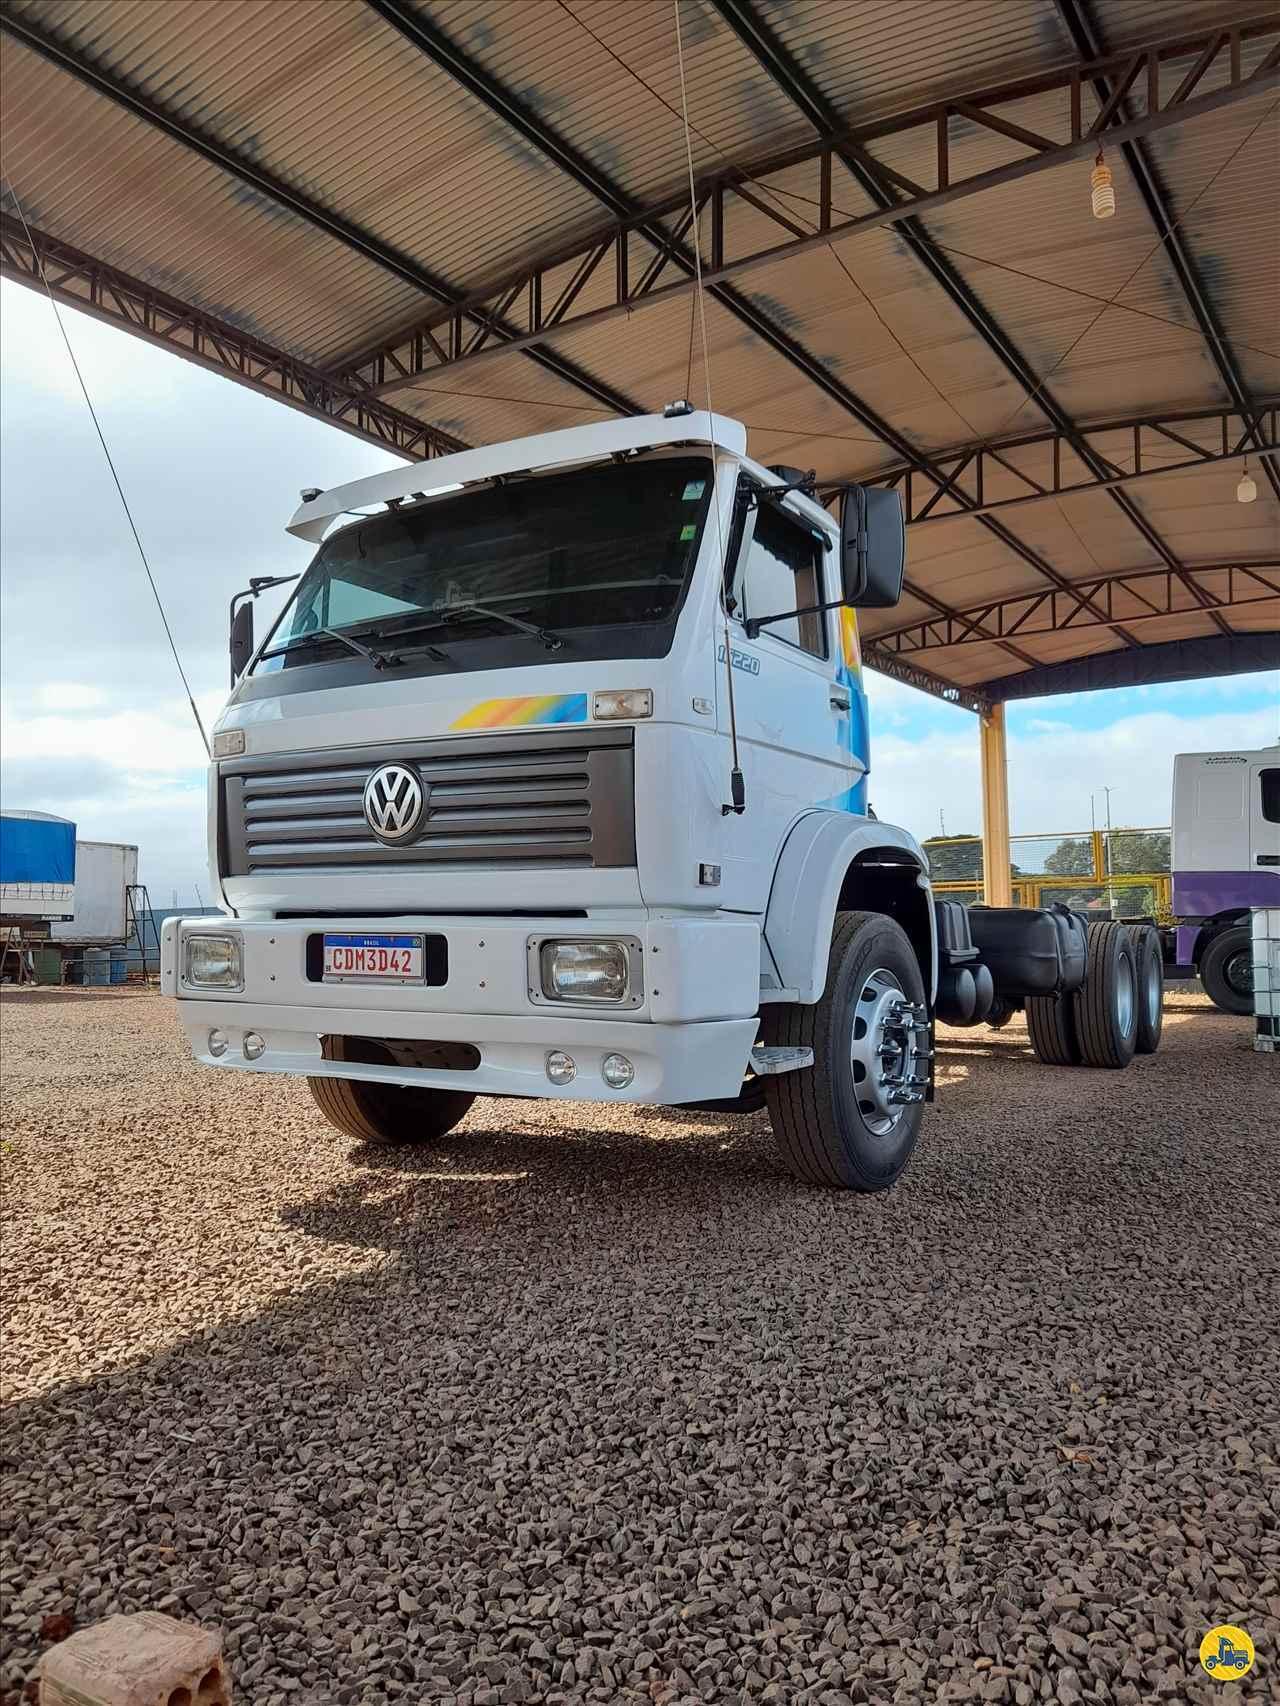 CAMINHAO VOLKSWAGEN VW 16220 Chassis Truck 6x2 Aratrans Estacionamento ARAPONGAS PARANÁ PR